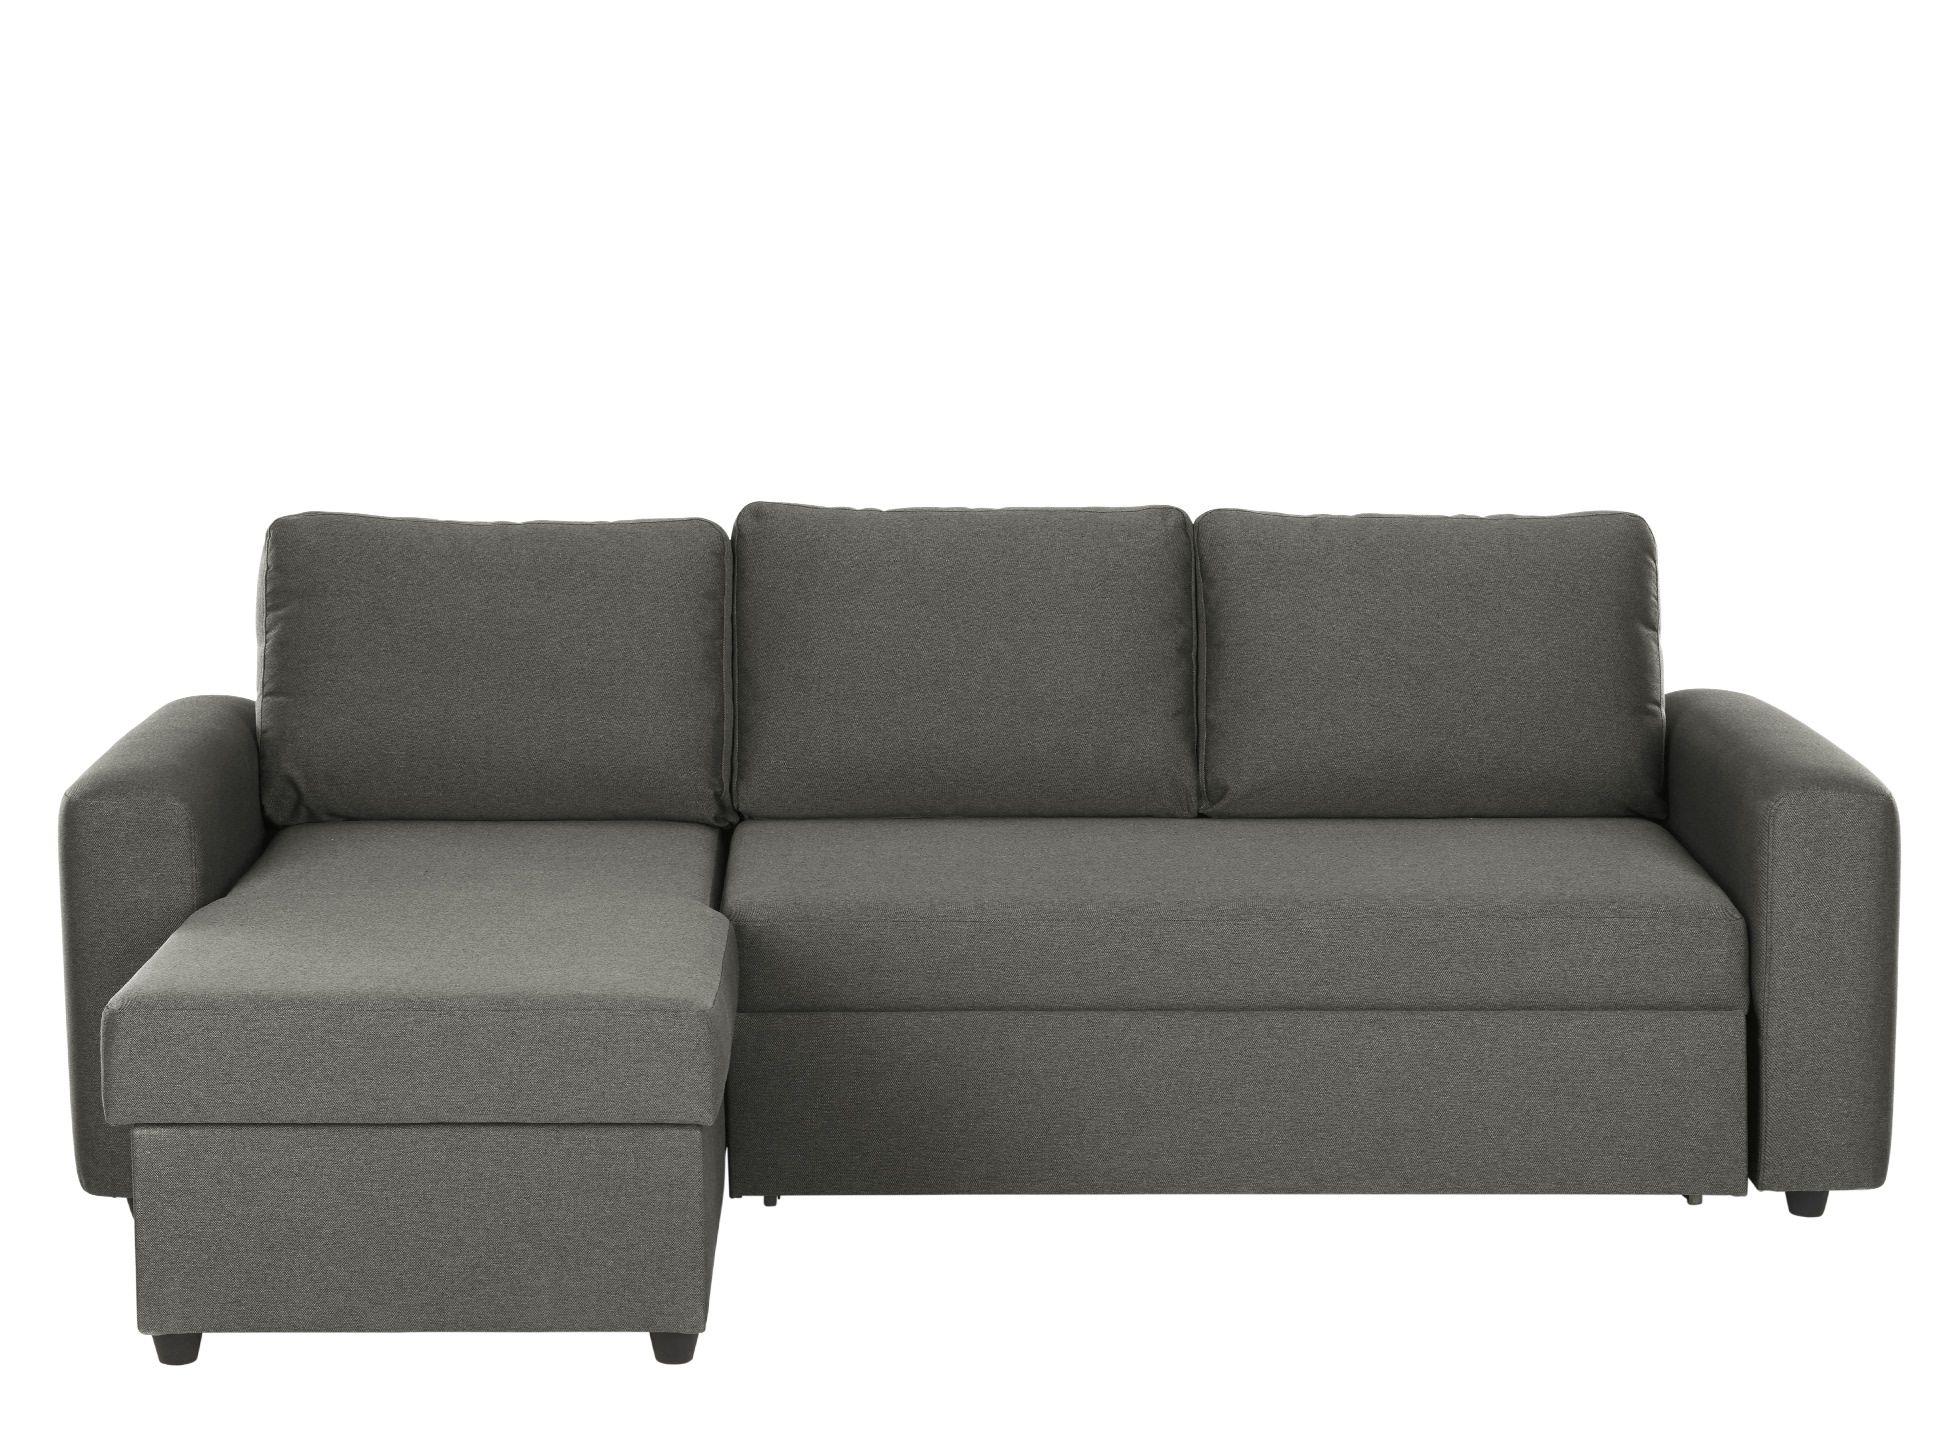 Aidian Corner Storage Sofa Bed, Pigeon Grey Sofa bed